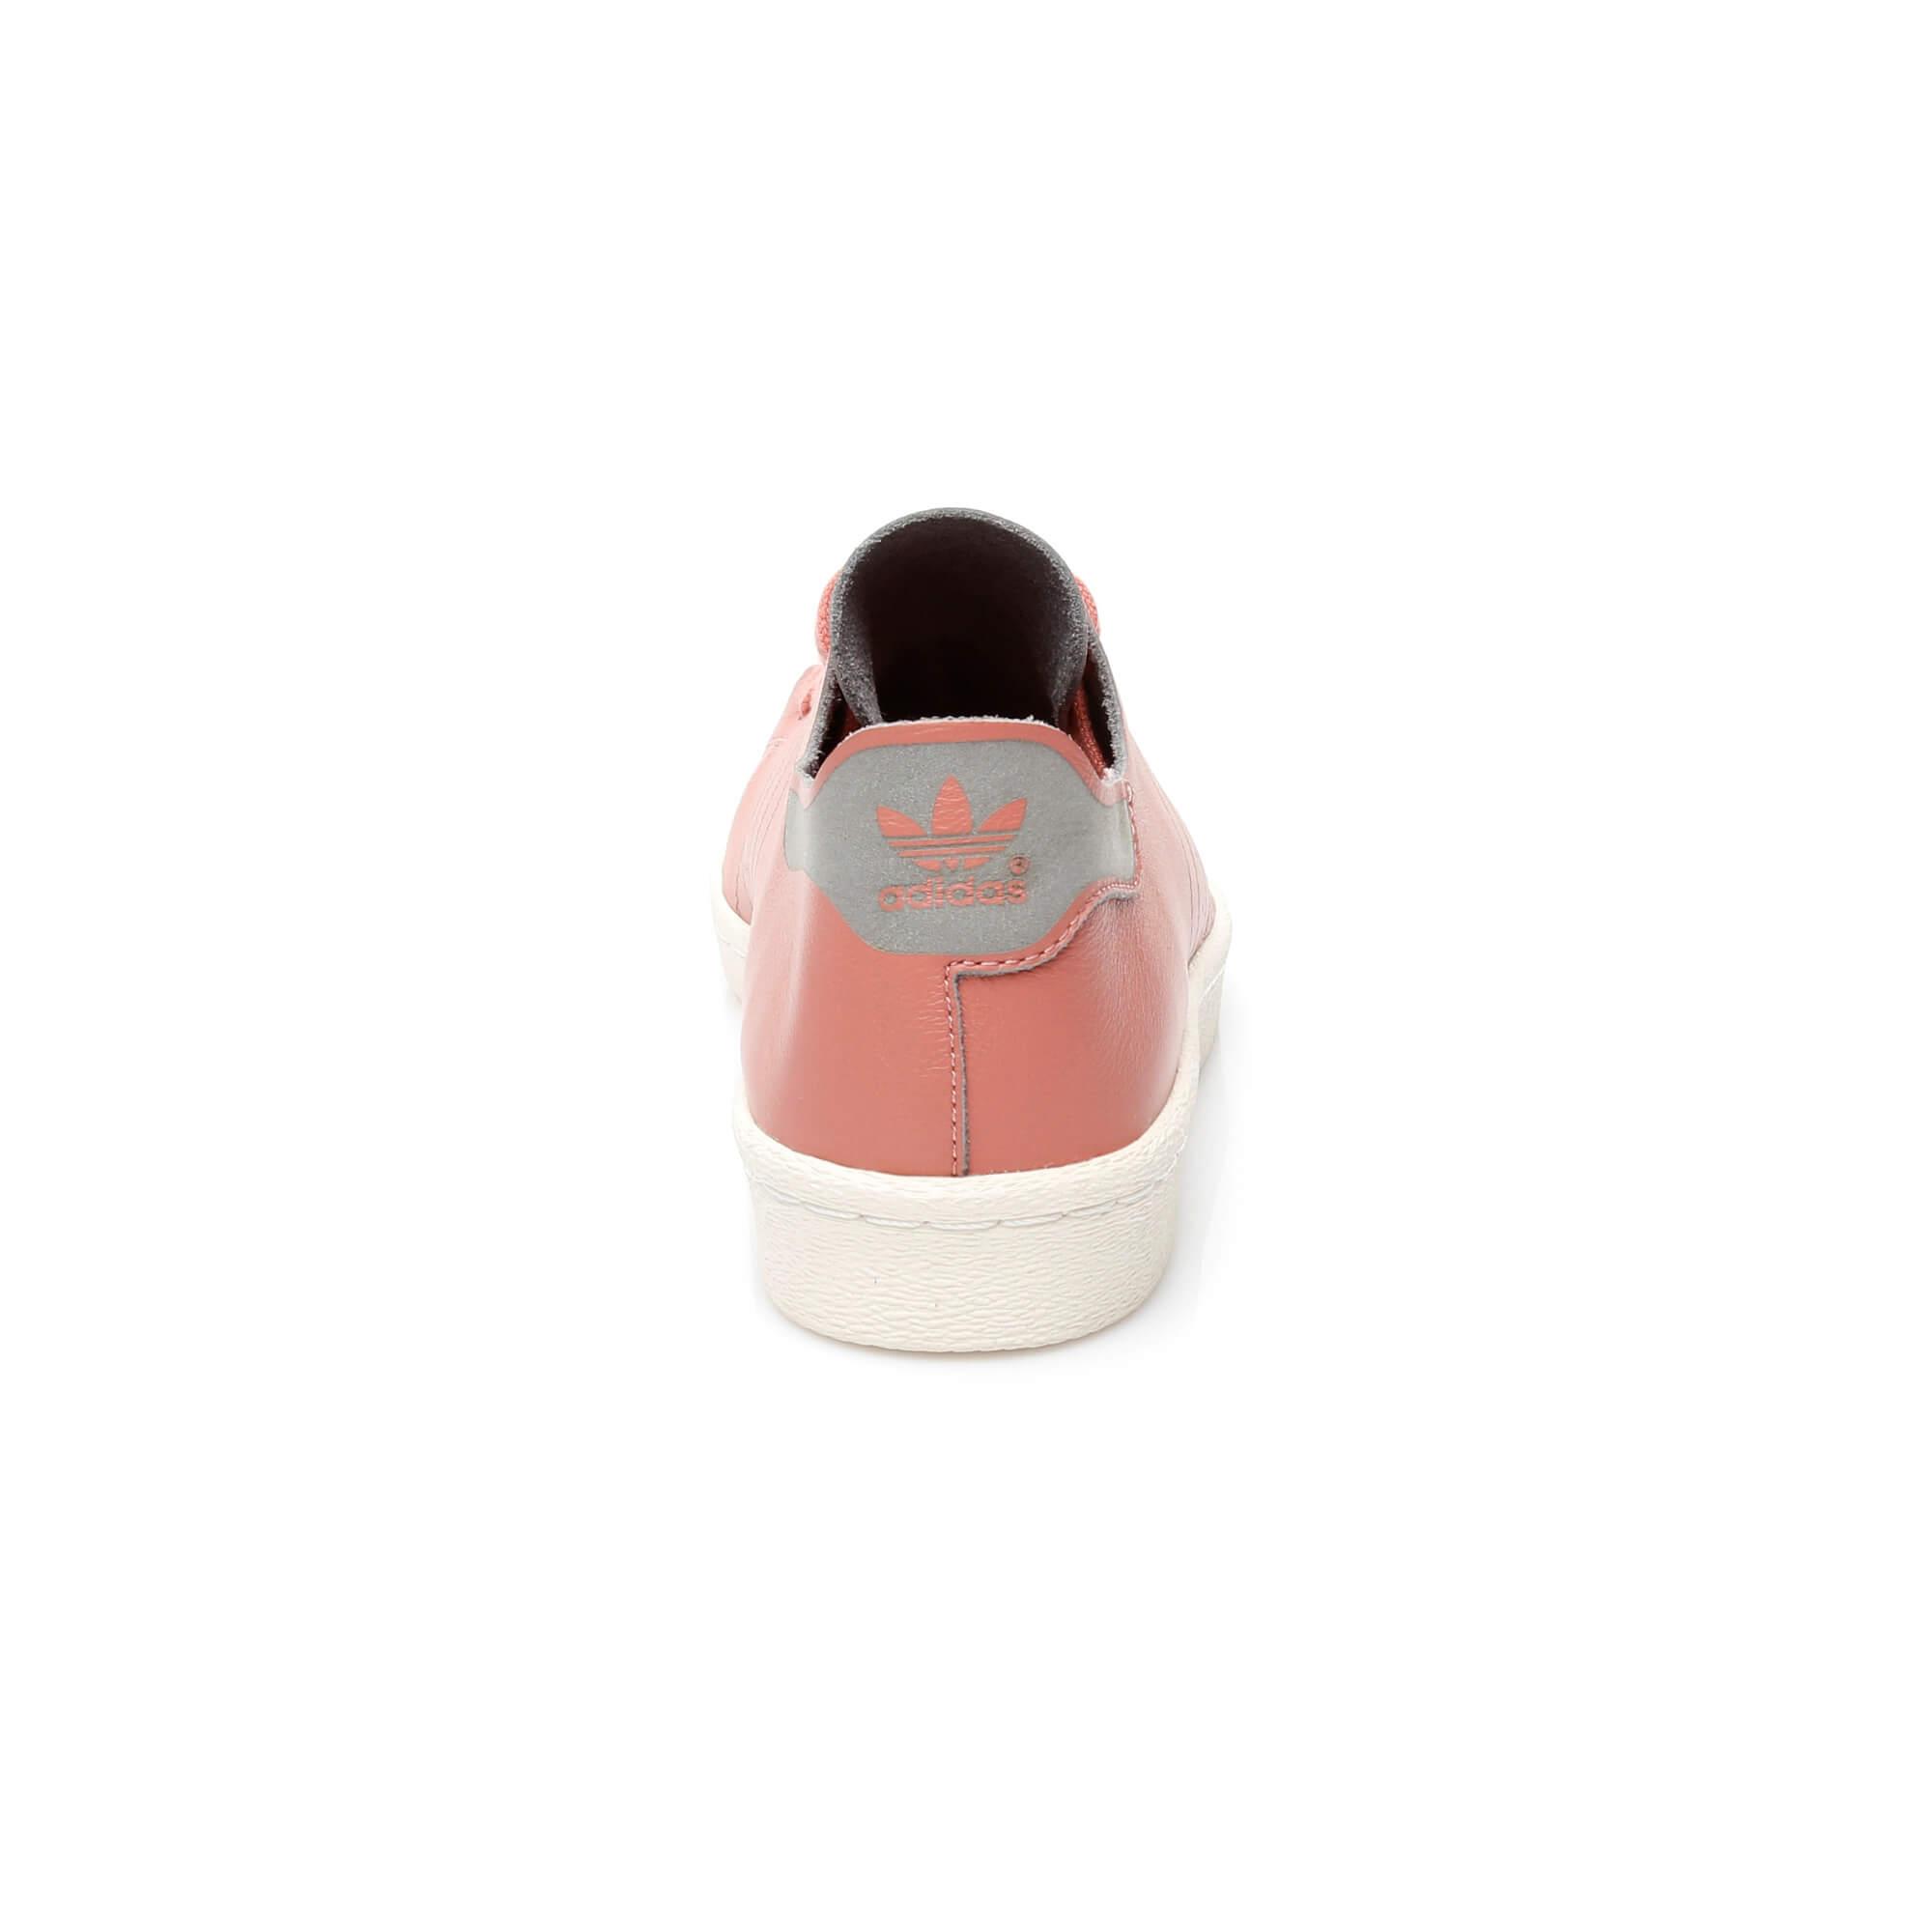 adidas Superstar 80'S Kadın Turuncu Sneaker